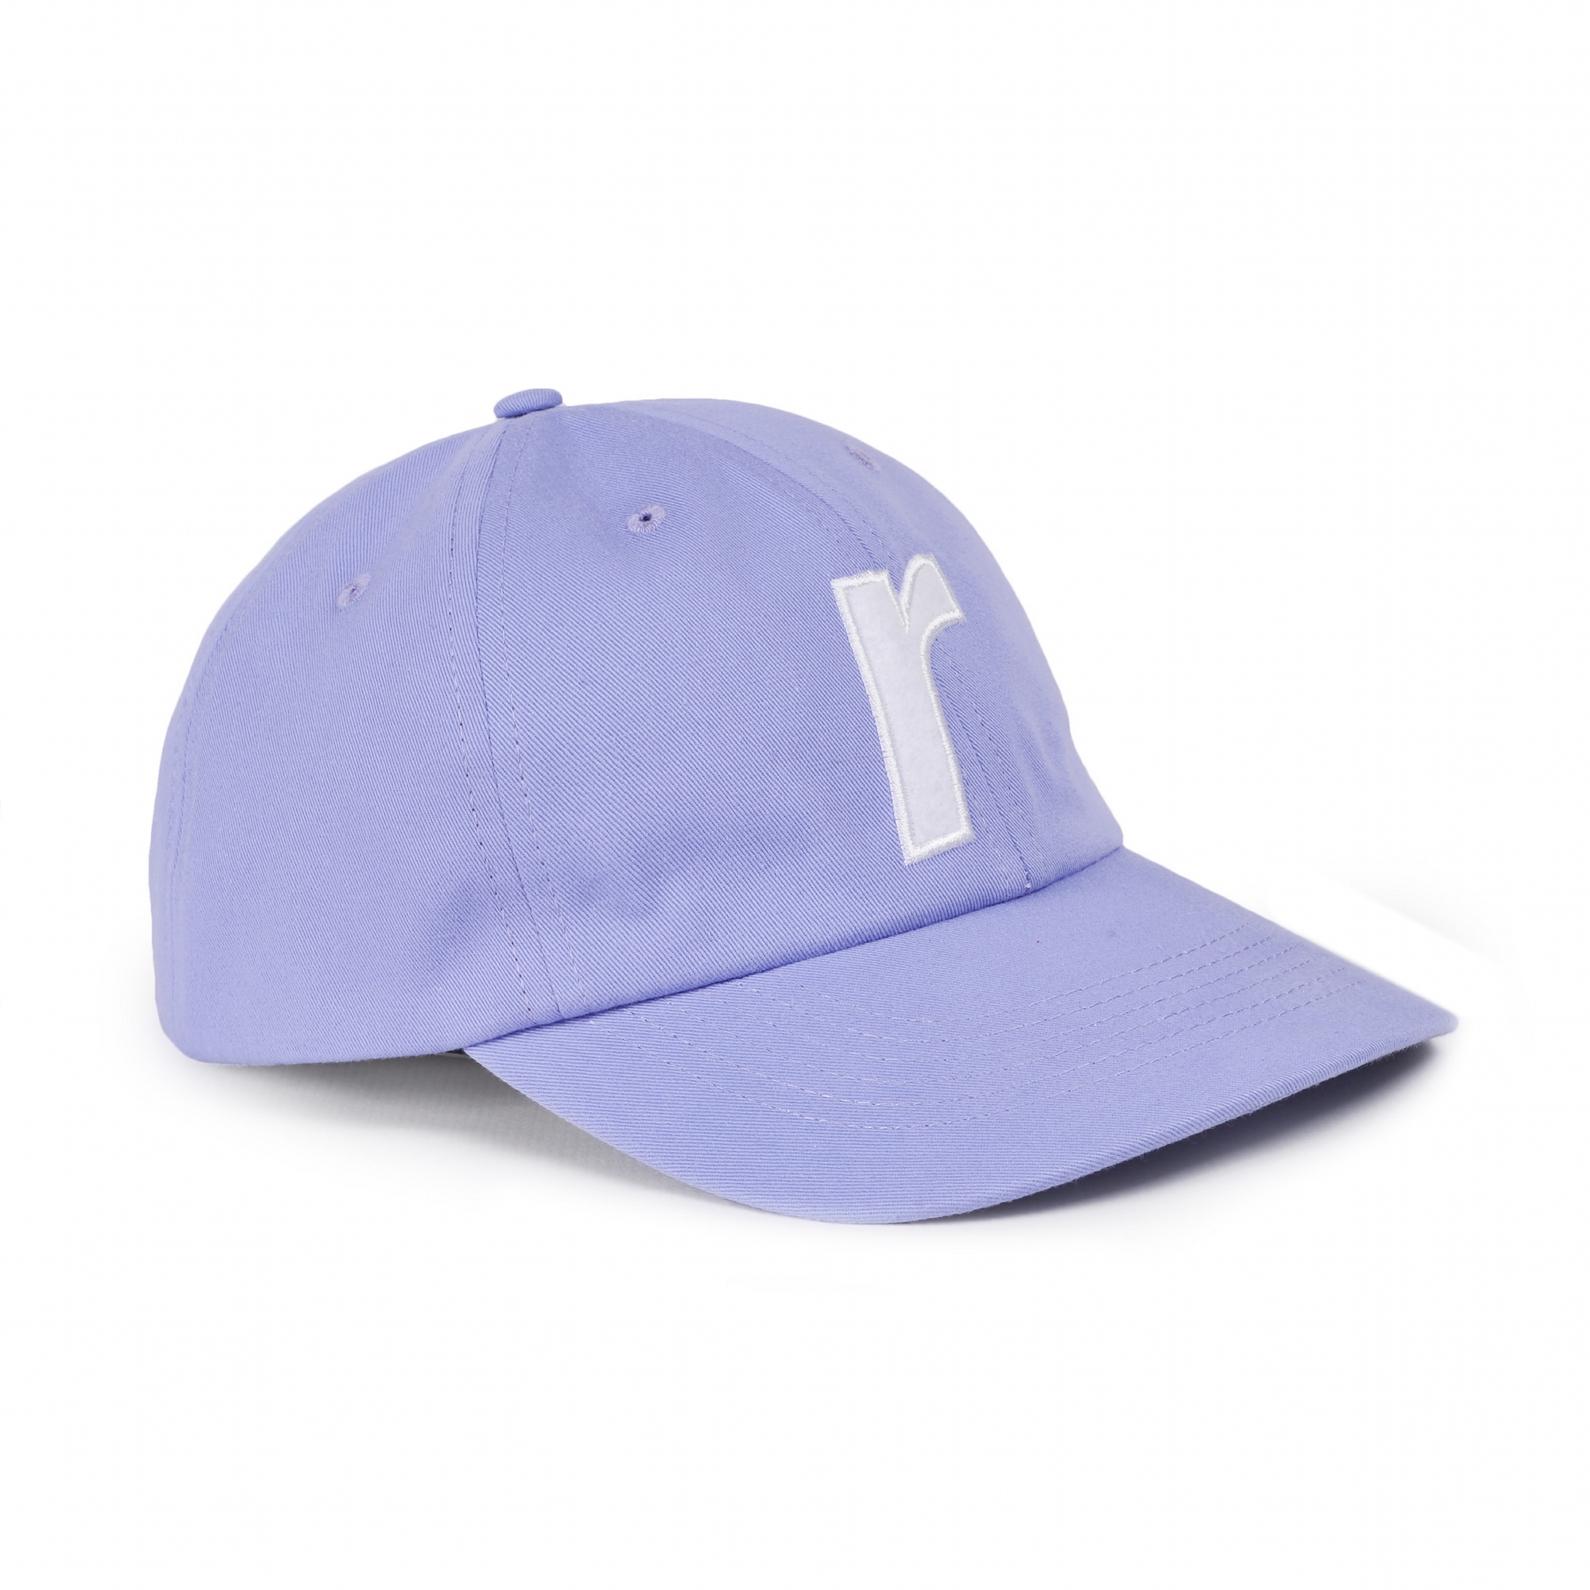 "【RAVE SKATEBOARDS/レイブスケートボード】R LOGO CAP ""FELT"" ダドキャップ / PURPLE"